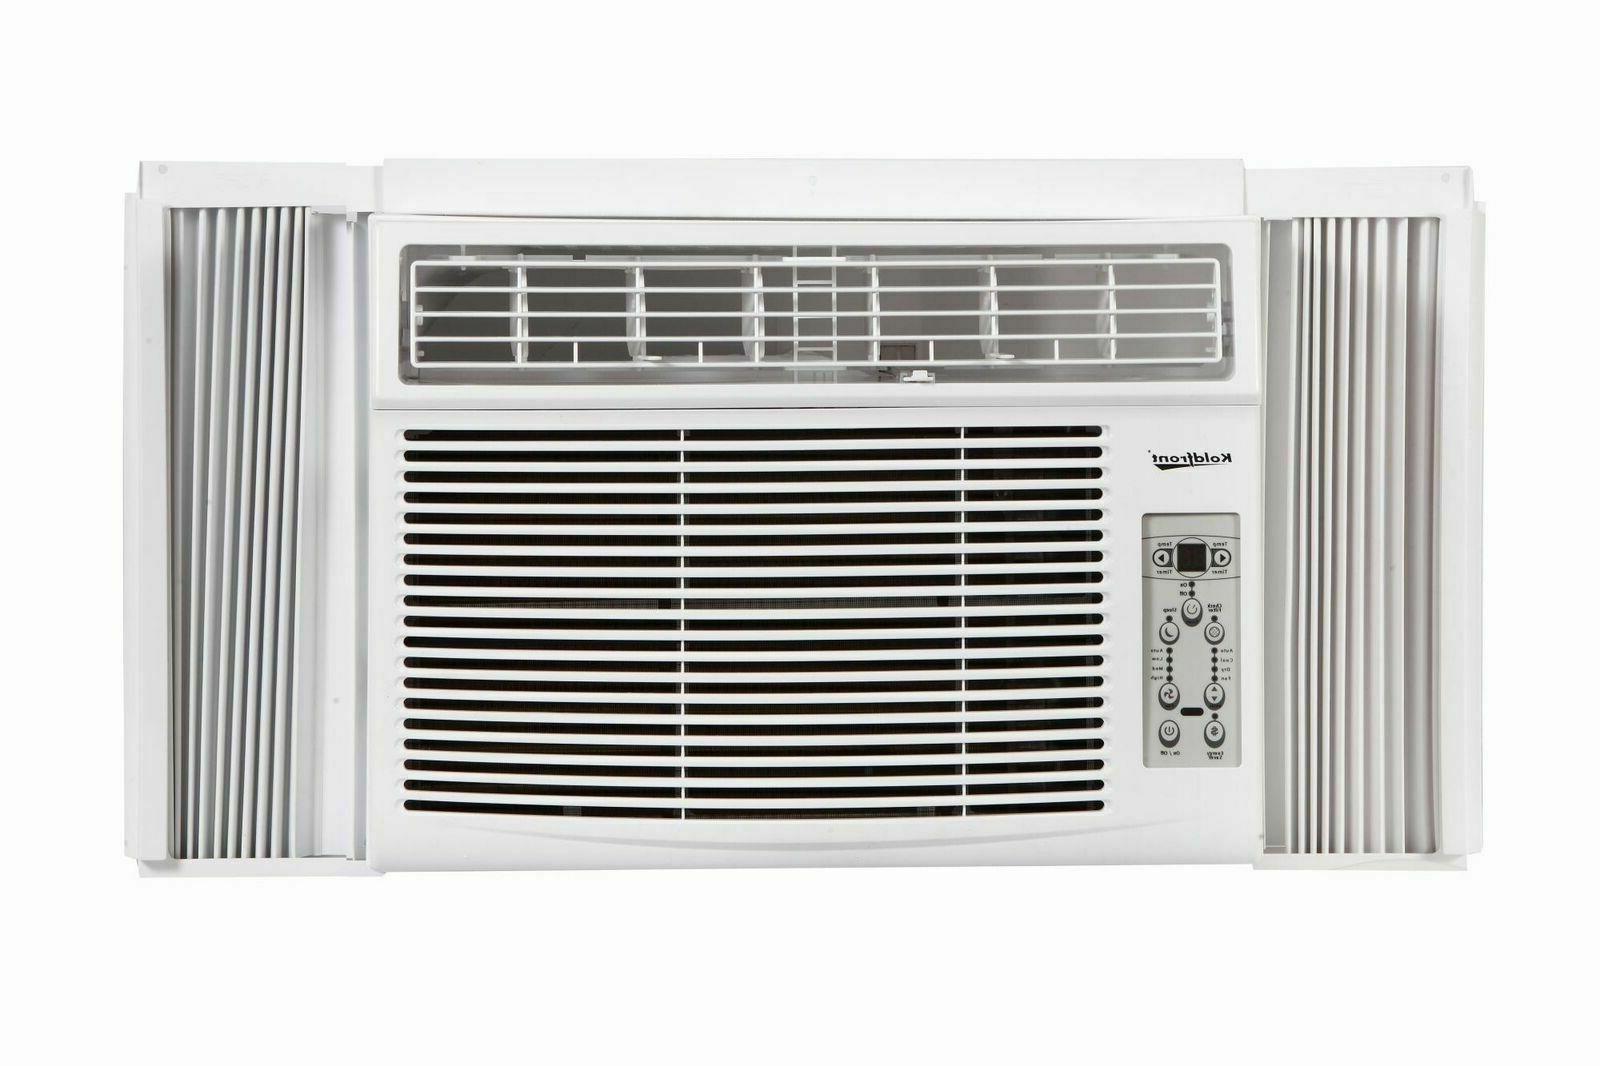 wac10003wco 10000 btu 115v window air conditioner